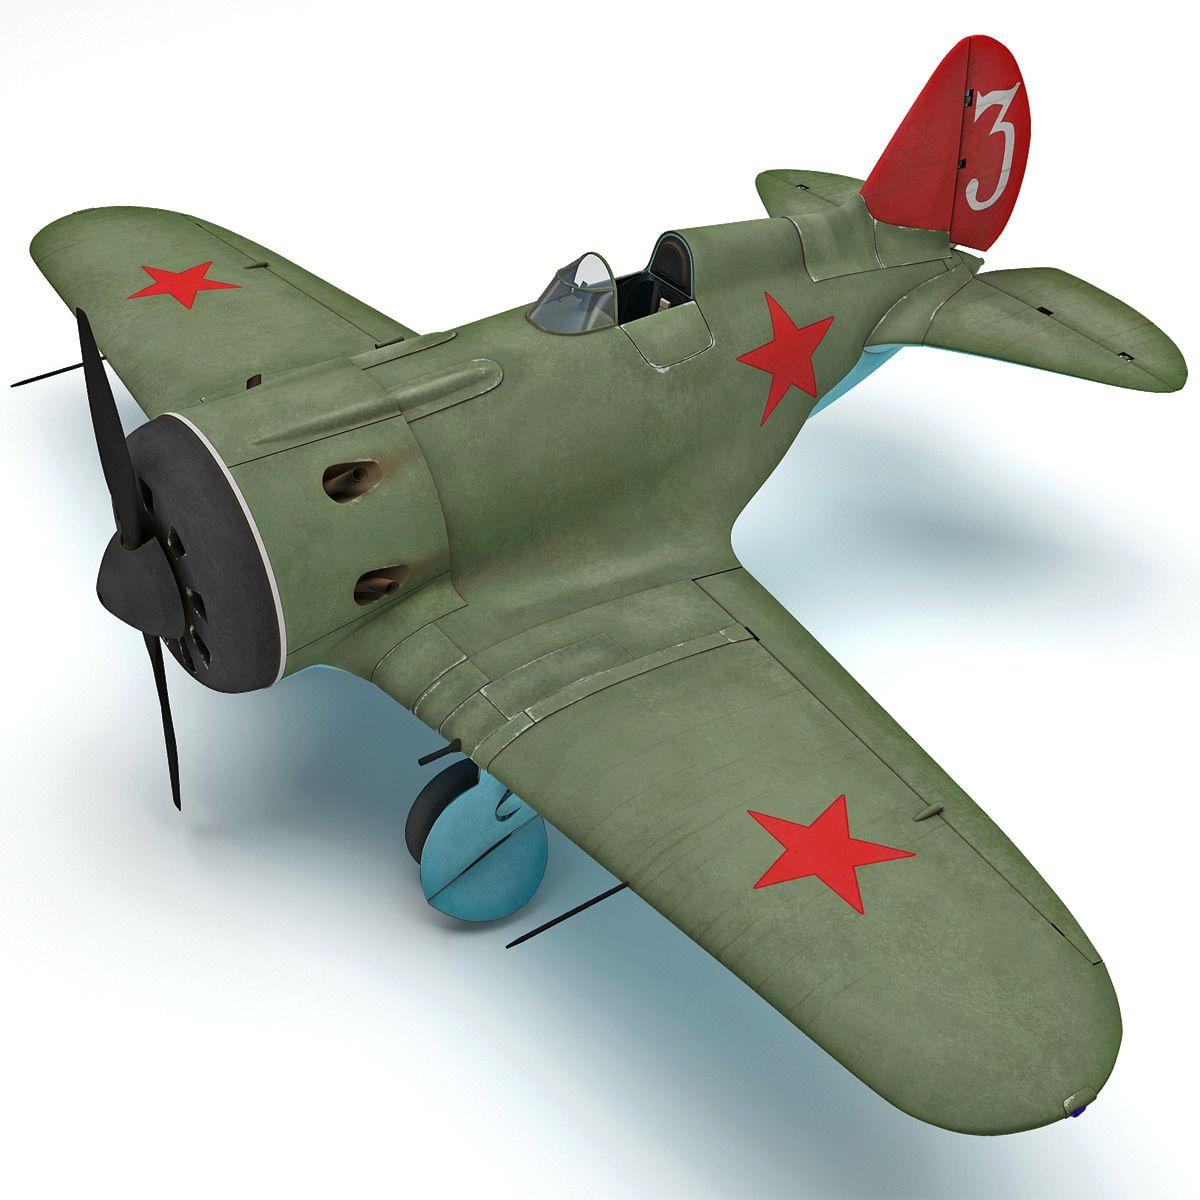 Polikarpov I 16 2 Rigged 3D Model - 3D Model